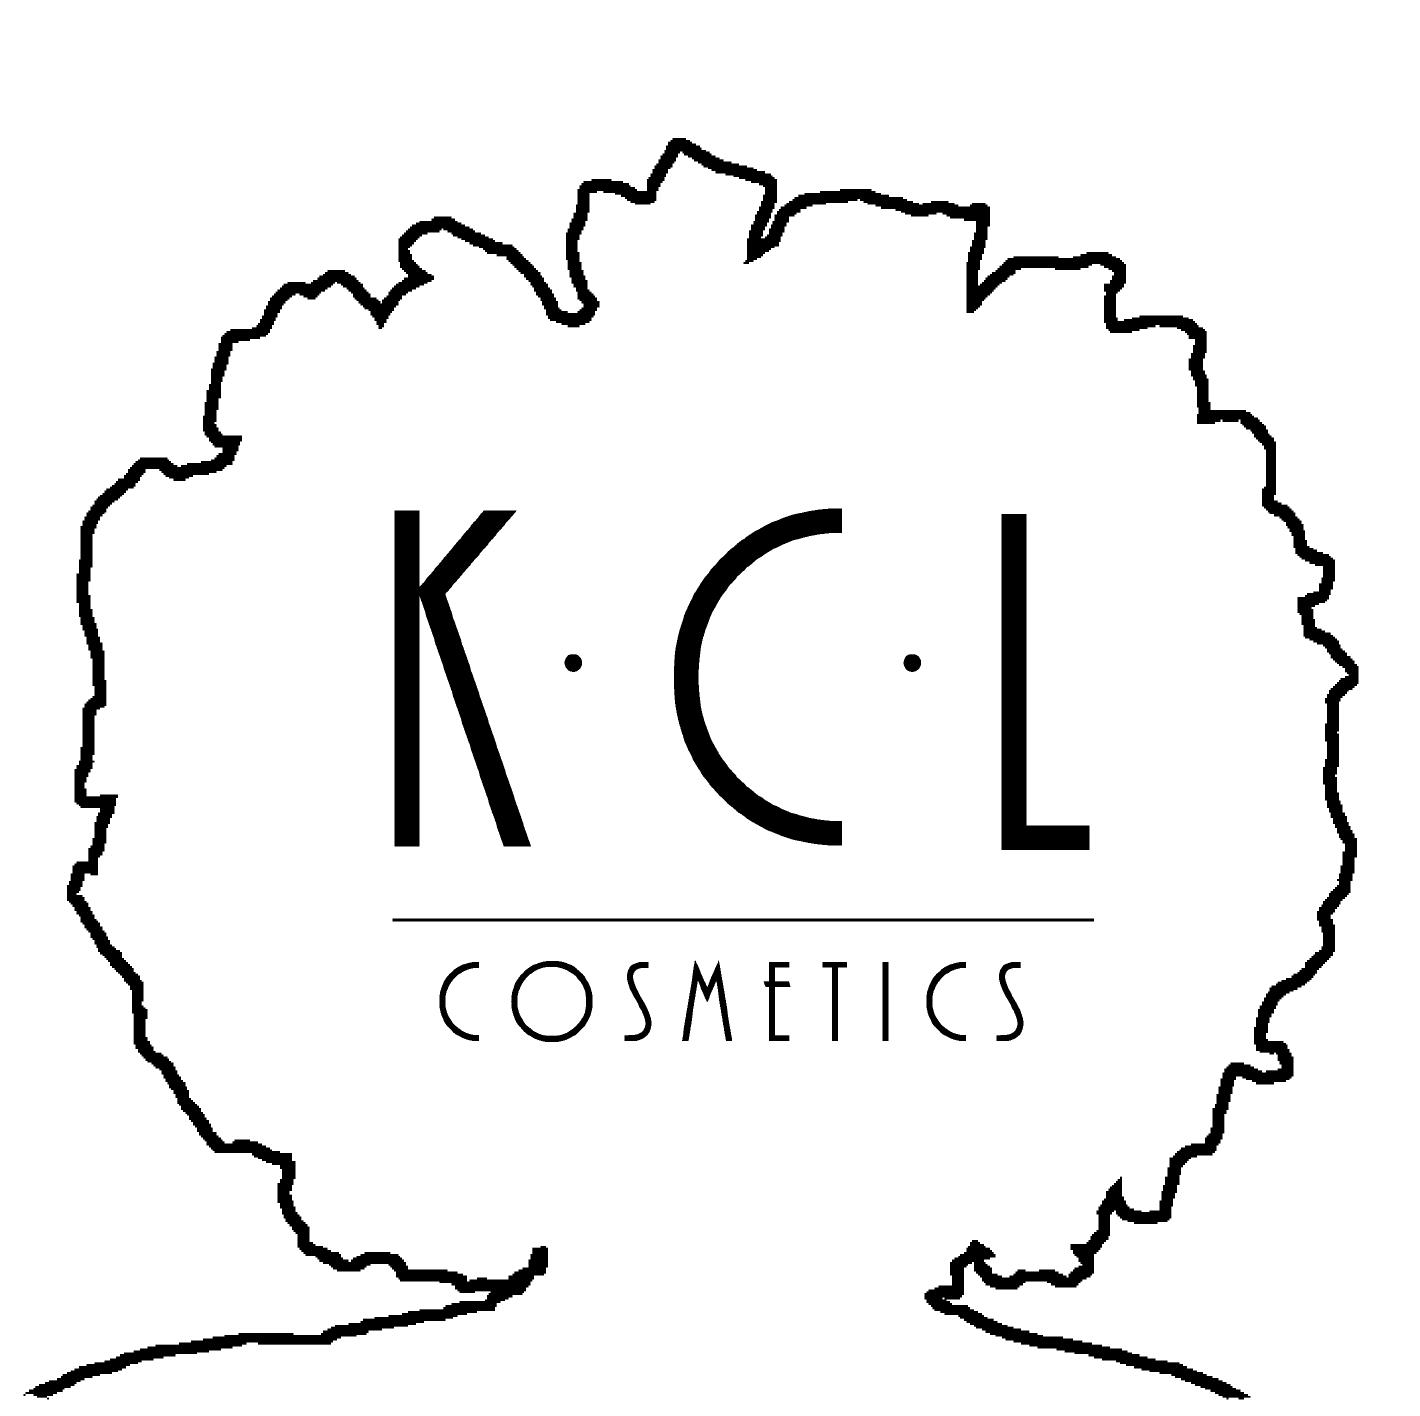 kcl-cosmetics logo doppelt so gross (black).png